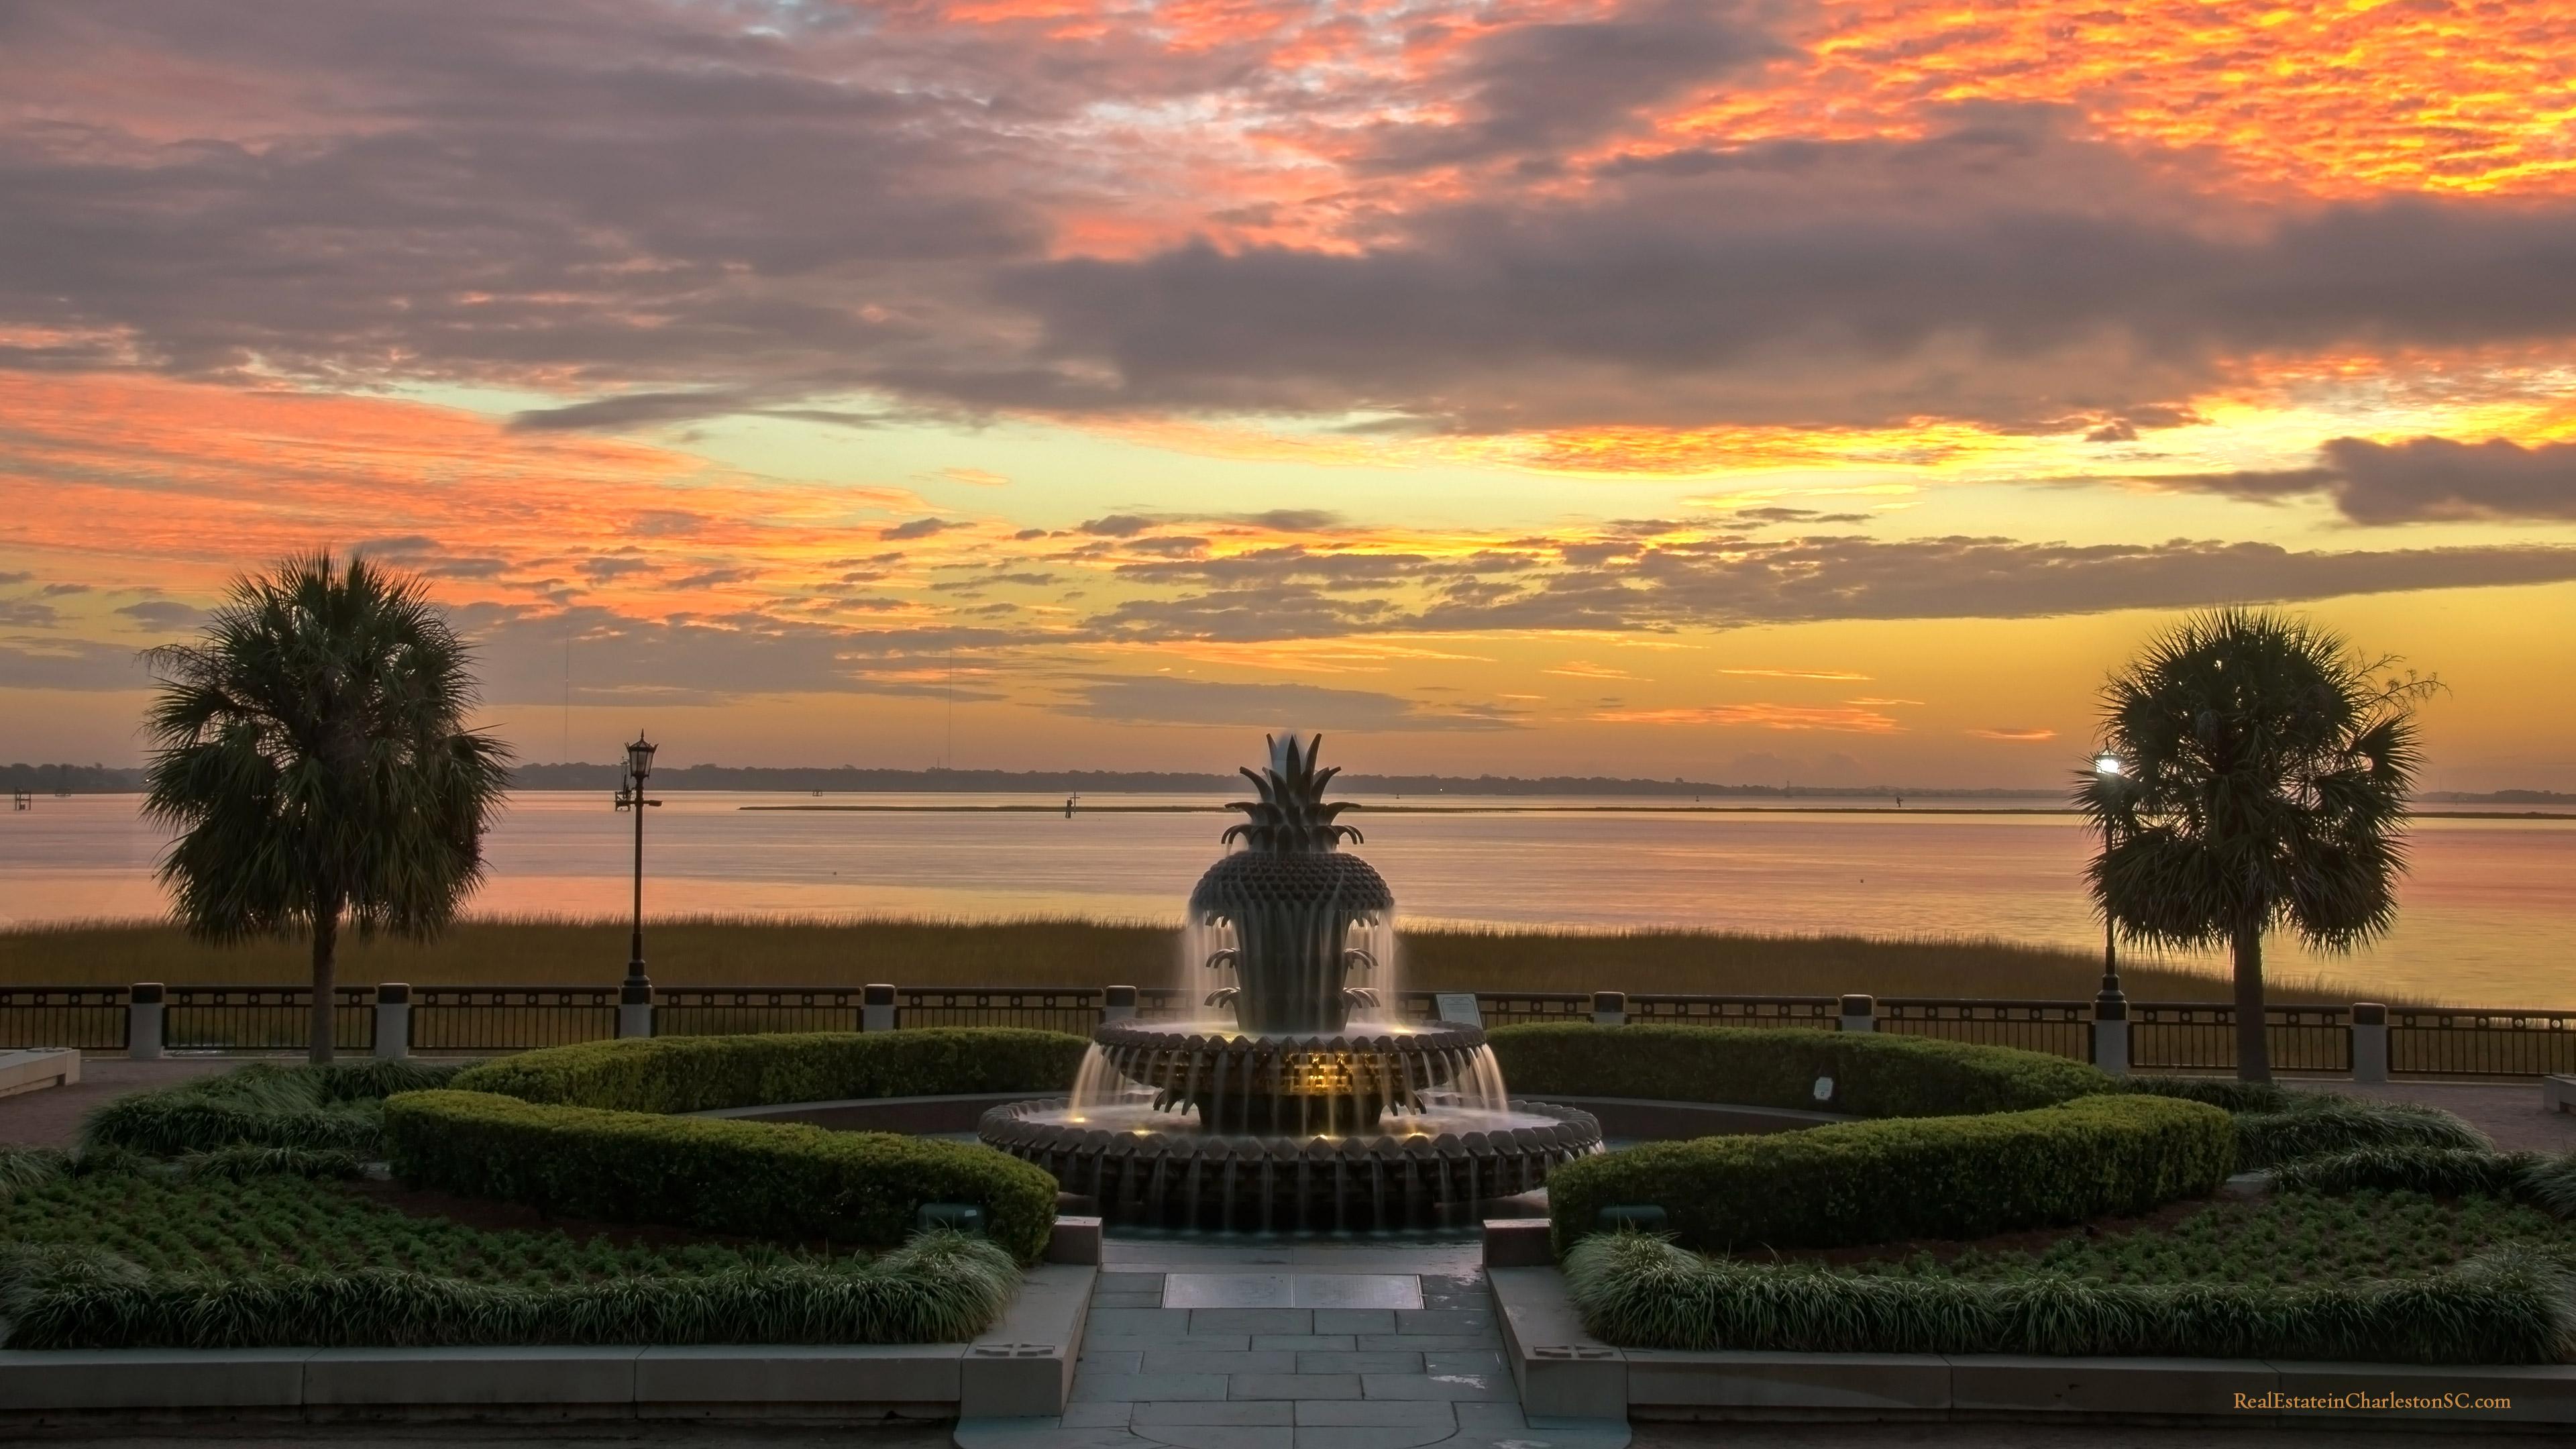 Charlestons Pineapple Fountain Dusk 3840x2160